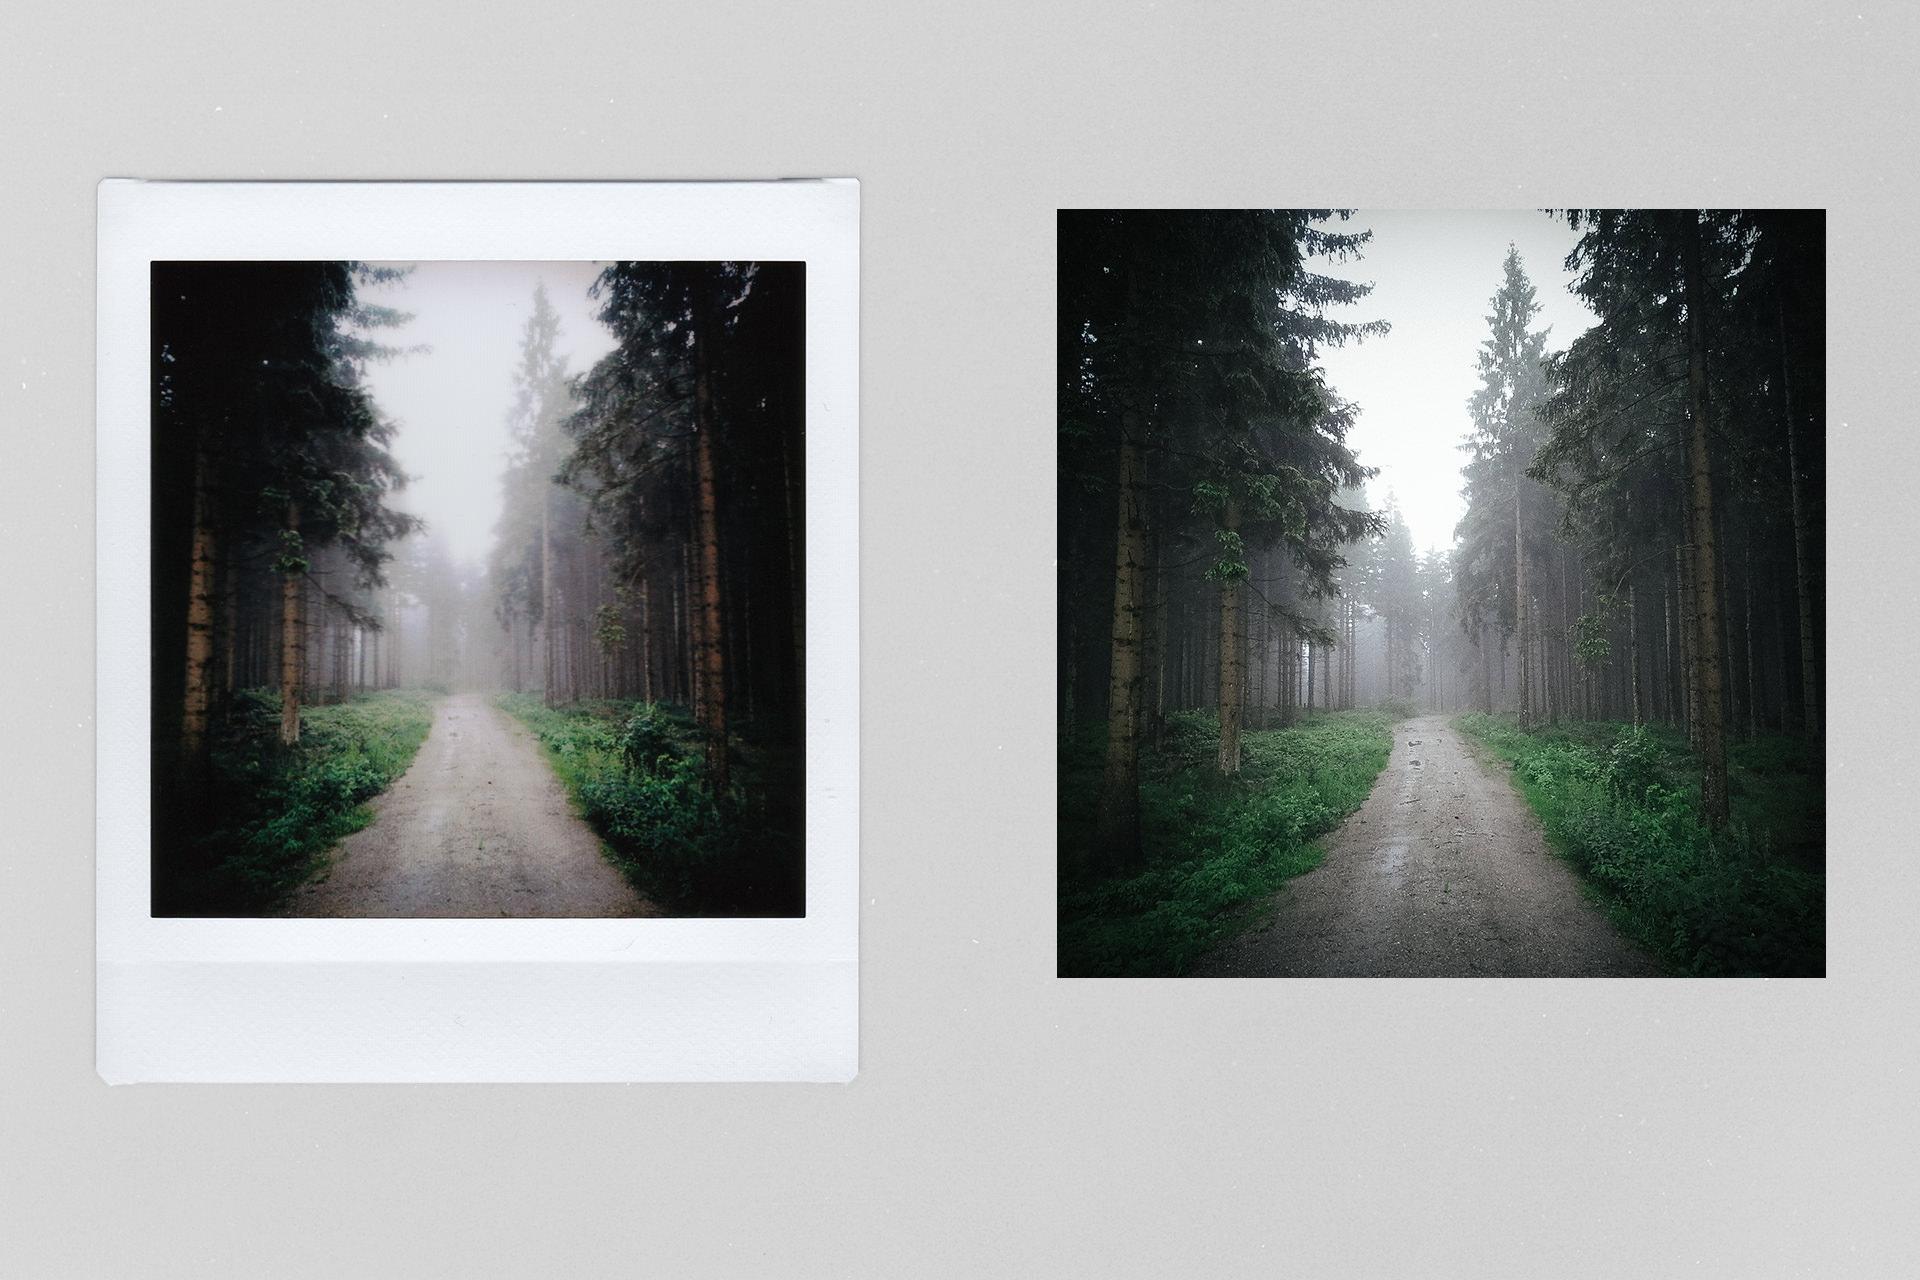 Wald im Harz mit Nebel – Fotografiert mit der Fuji Instax SQ10